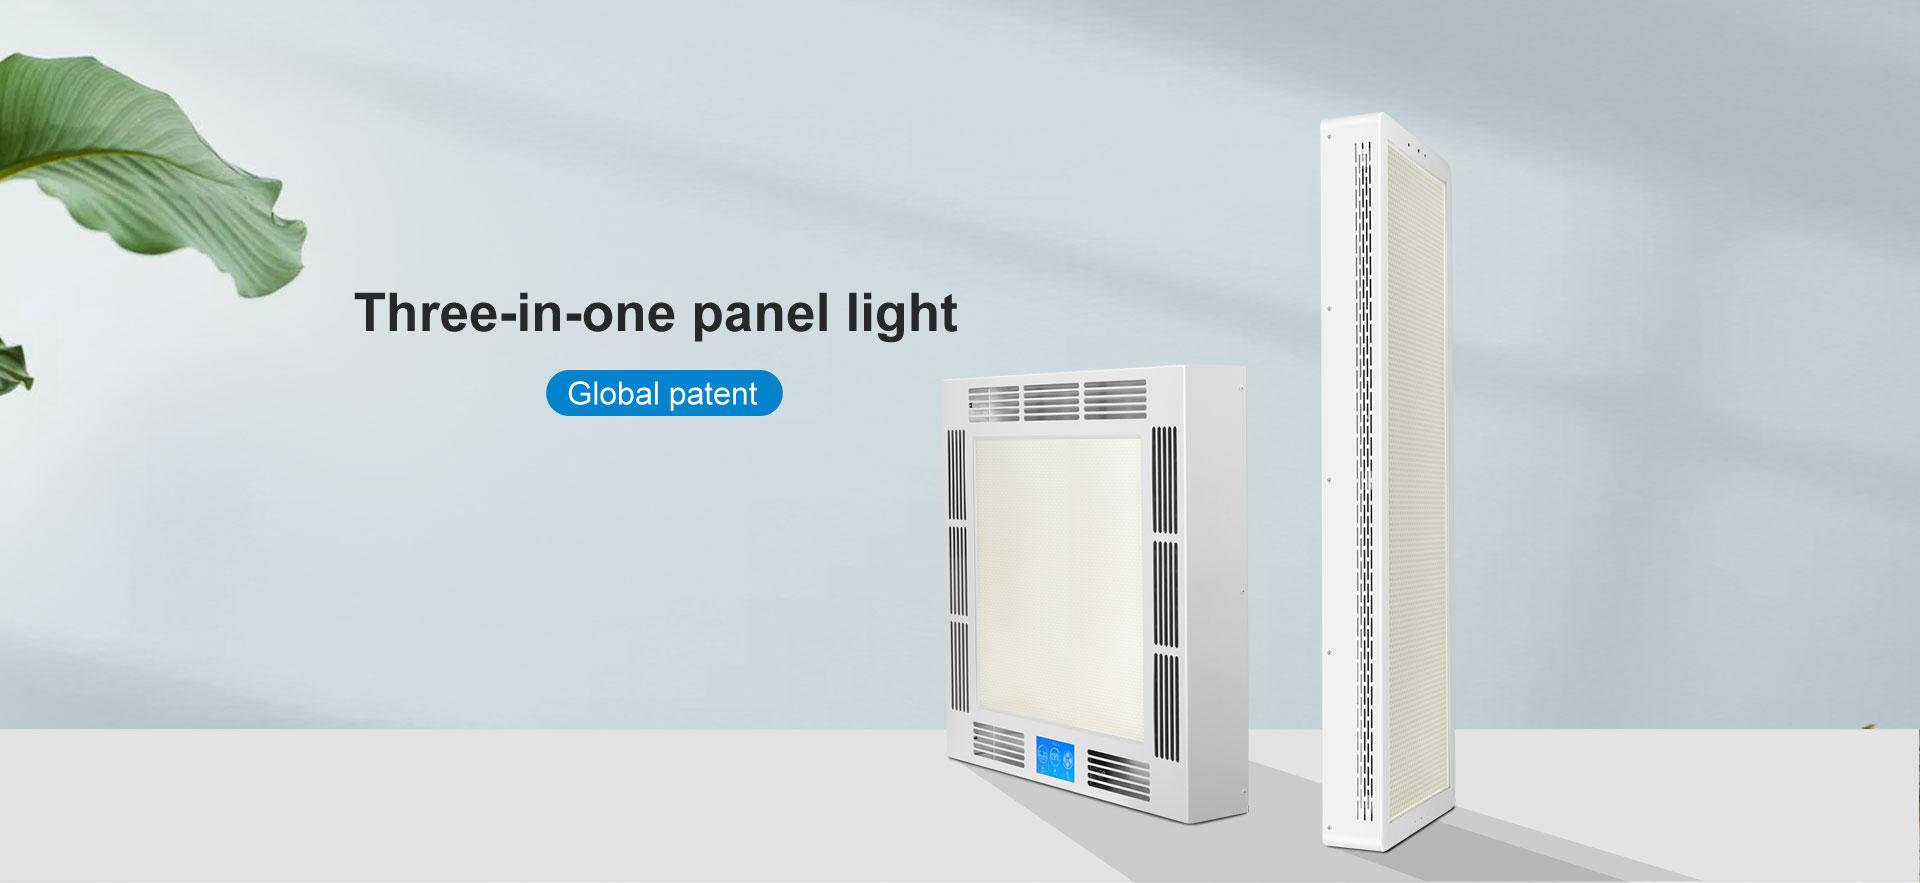 Three-in-one panel light